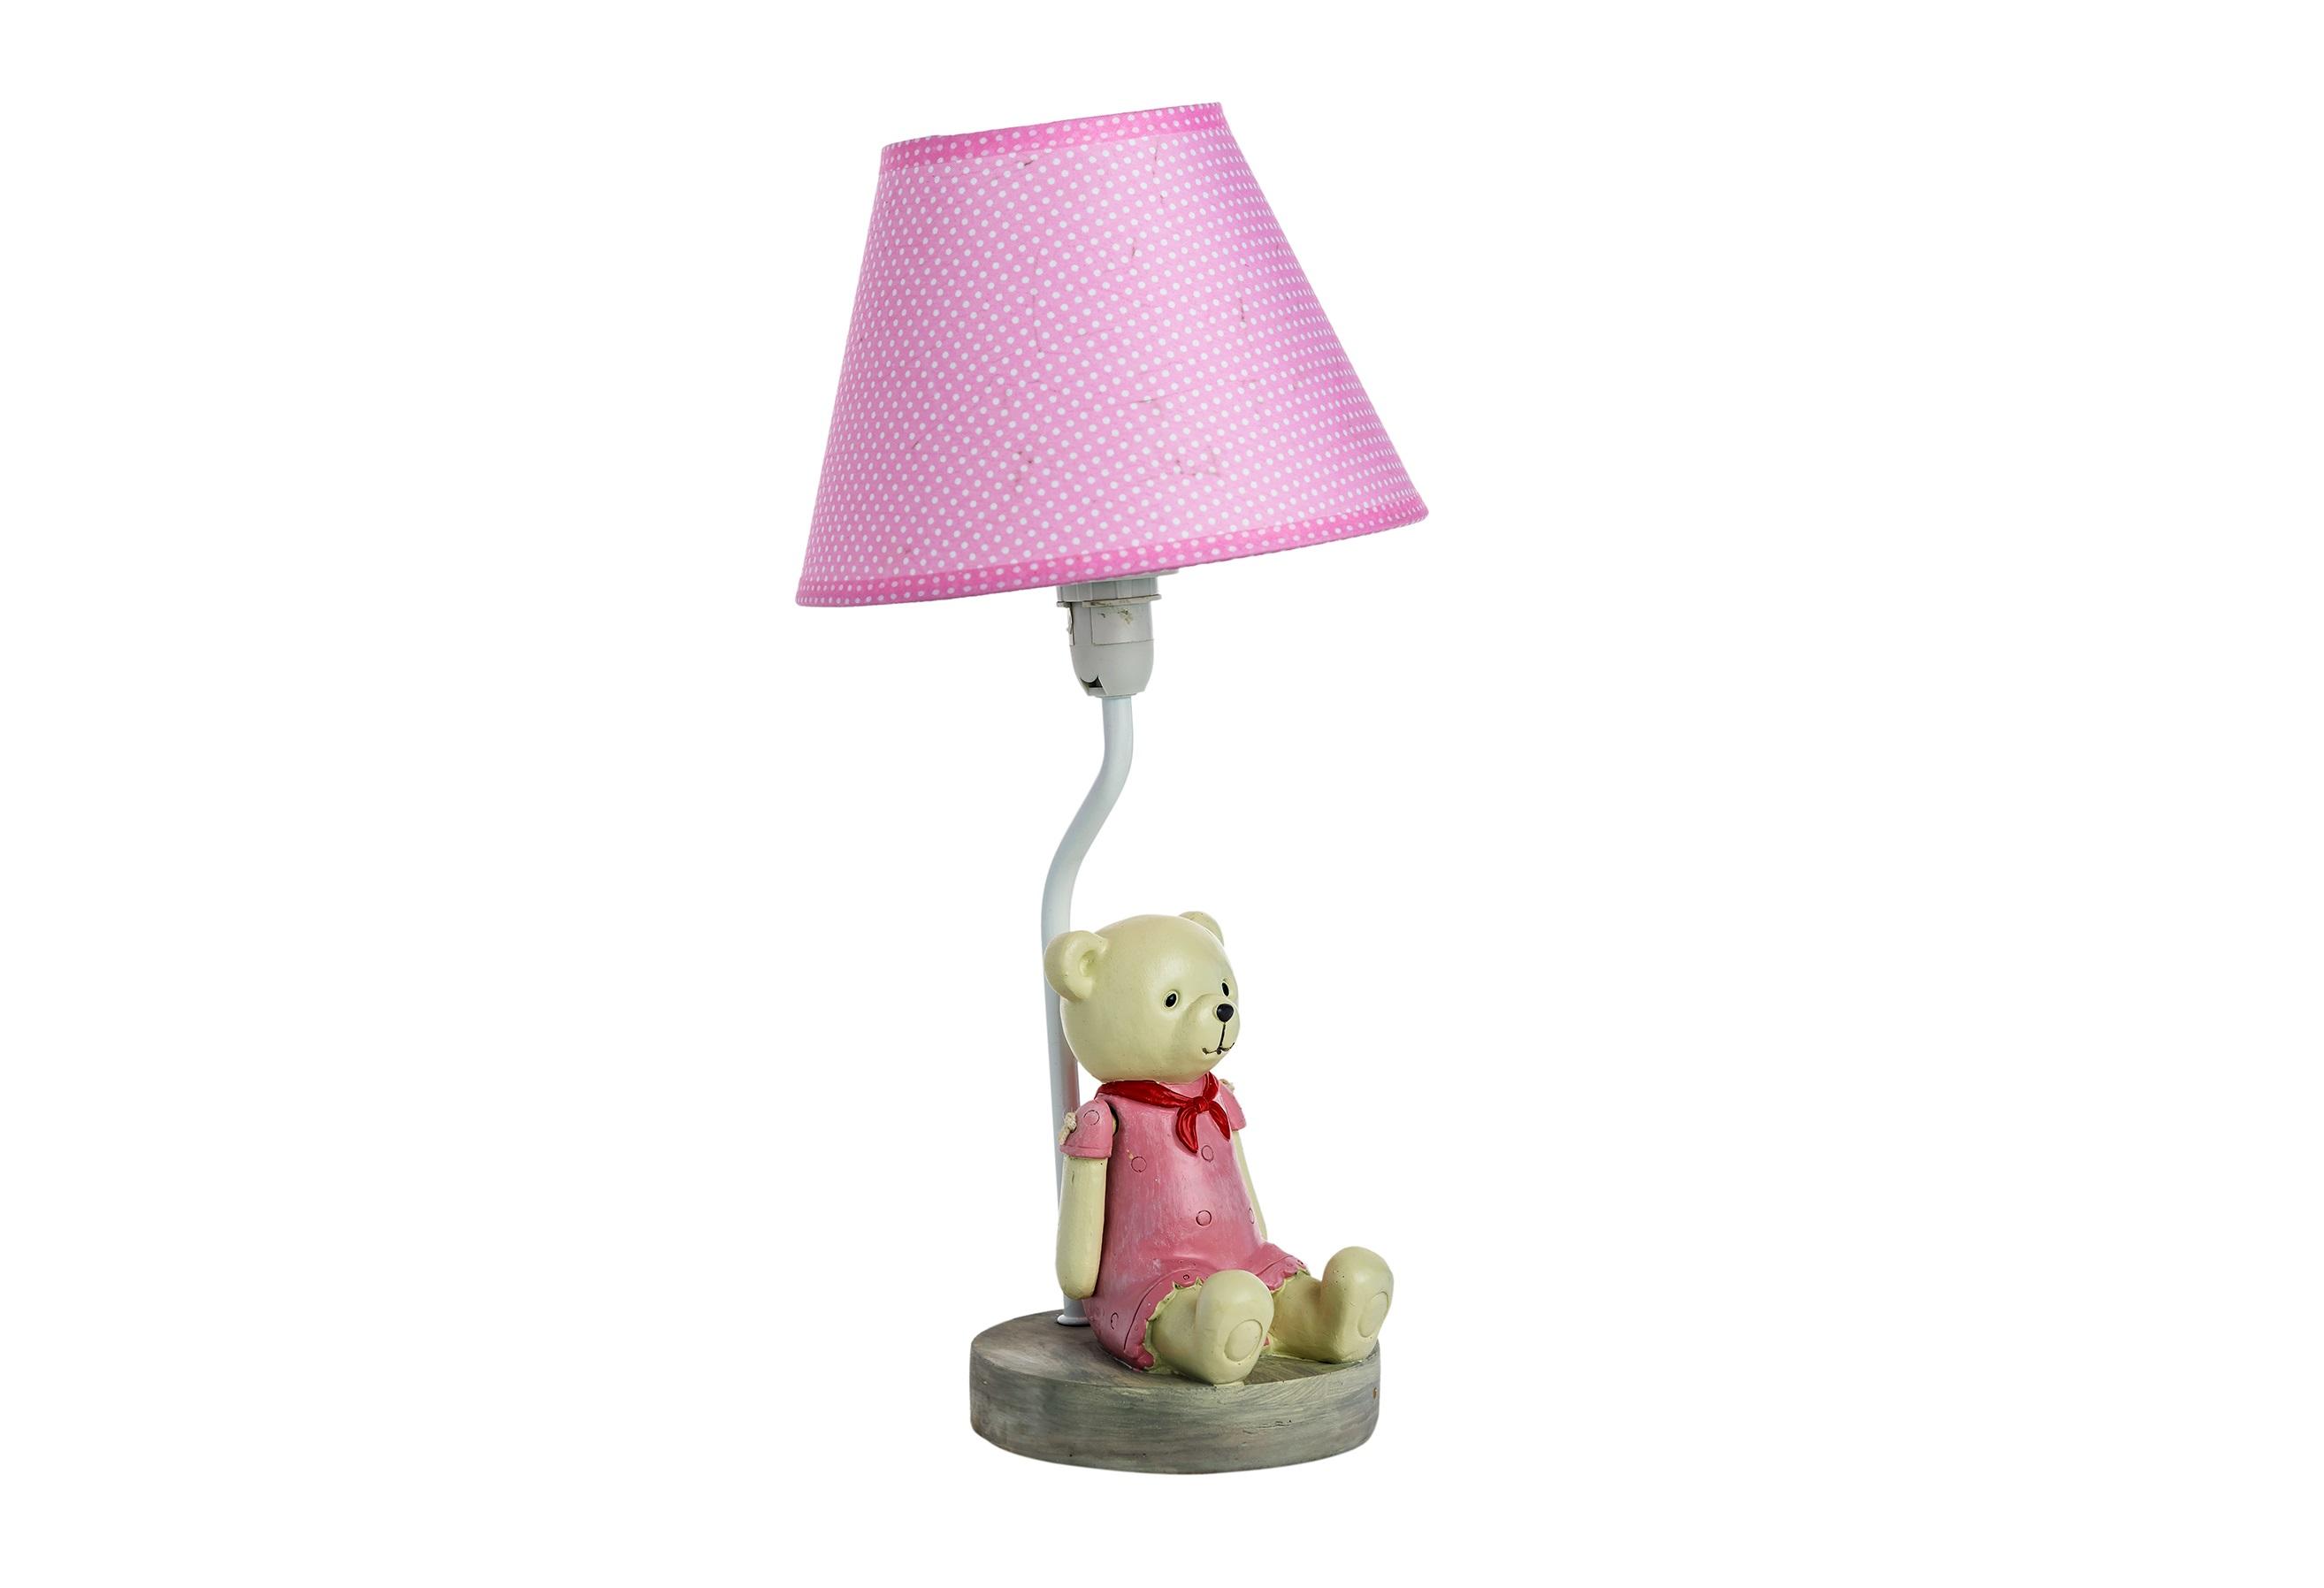 Детская настольная лампа МедведицаДекоративные лампы<br>&amp;lt;div&amp;gt;Тип цоколя: E27&amp;lt;/div&amp;gt;&amp;lt;div&amp;gt;Мощность: 40W&amp;lt;/div&amp;gt;&amp;lt;div&amp;gt;Кол-во ламп: 1 (нет в комплекте)&amp;lt;/div&amp;gt;<br><br>Material: Полирезин<br>Length см: None<br>Width см: None<br>Height см: 35<br>Diameter см: 18